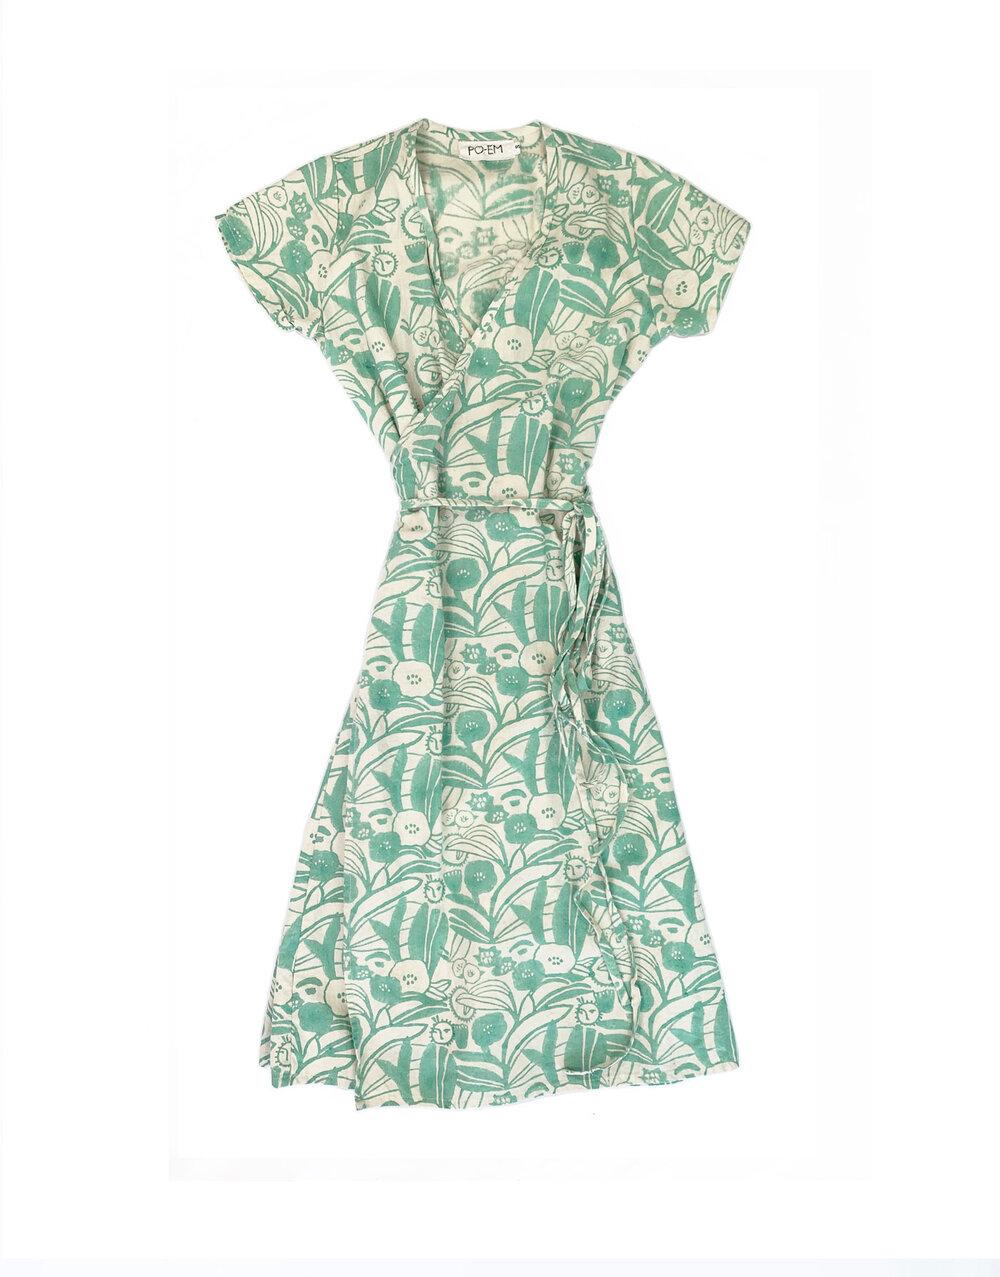 Ode Dress in Camo